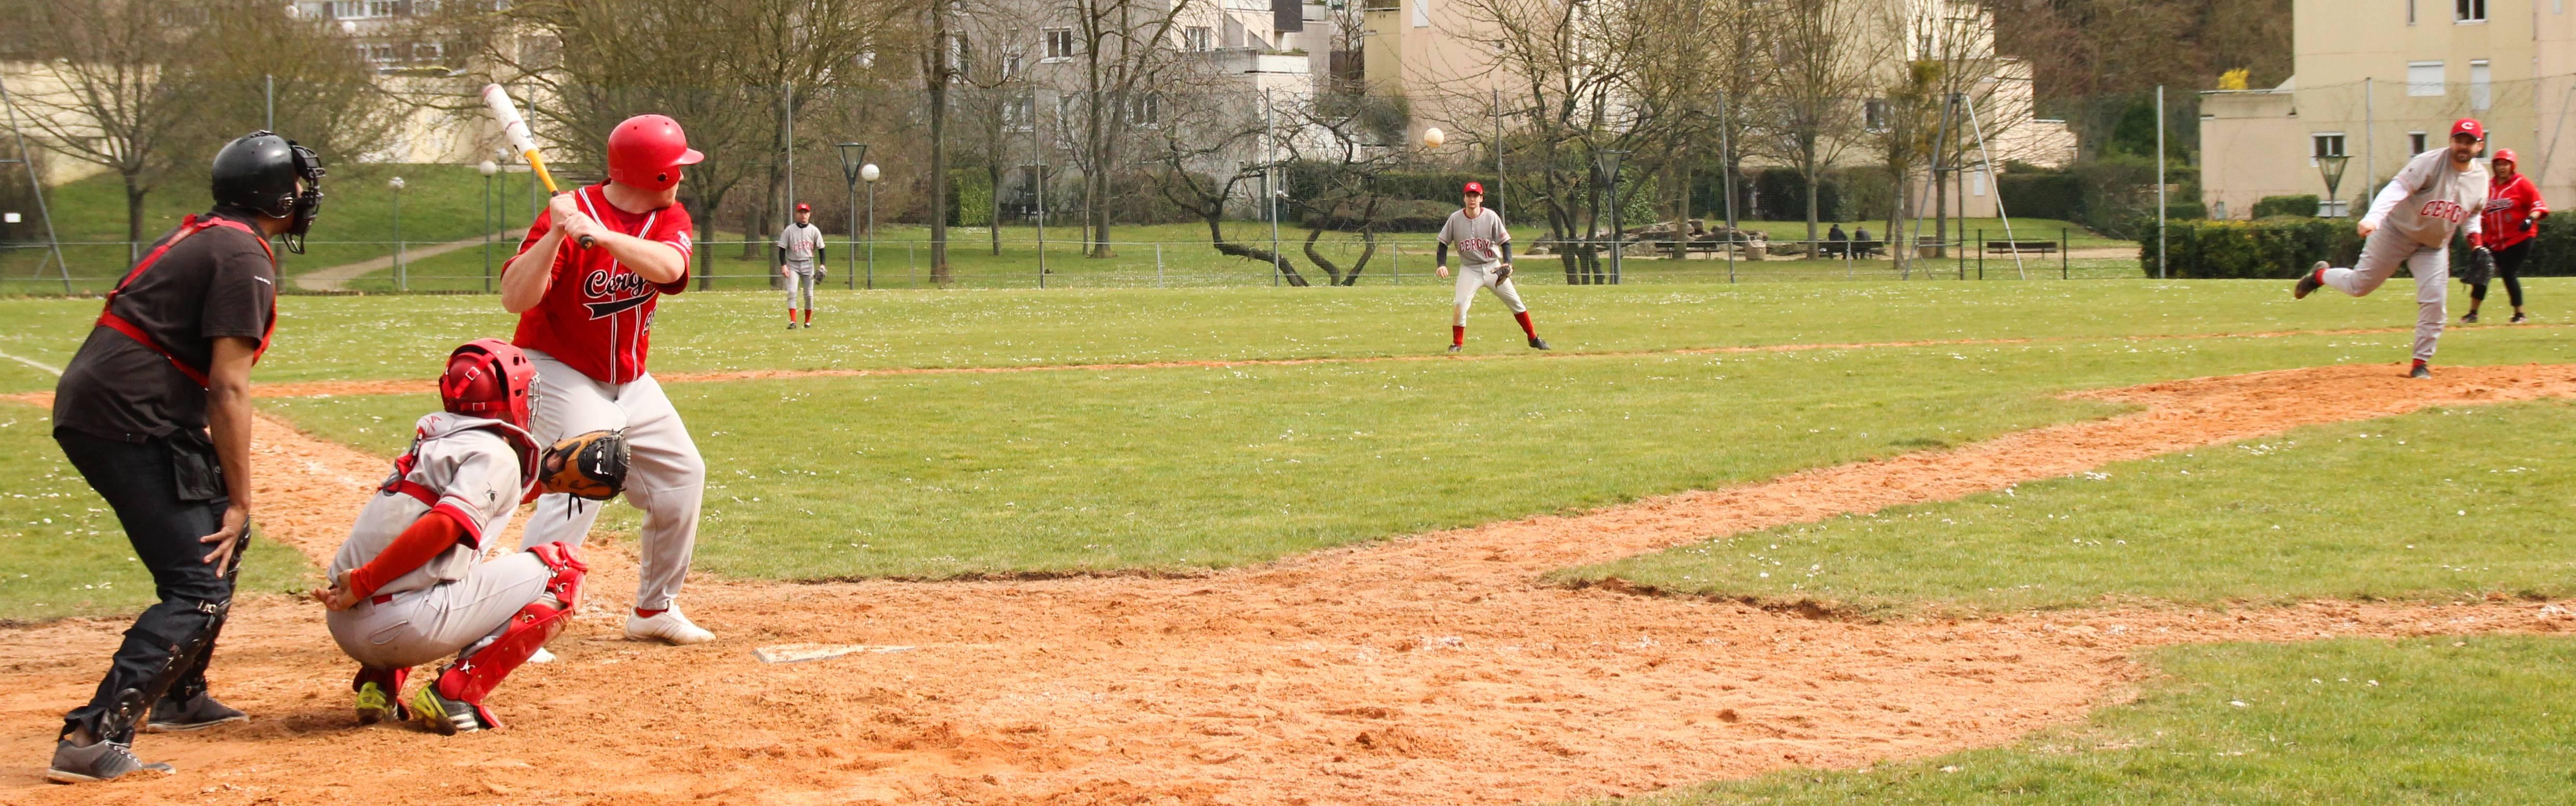 2015-03-28 Baseball R3 (67)